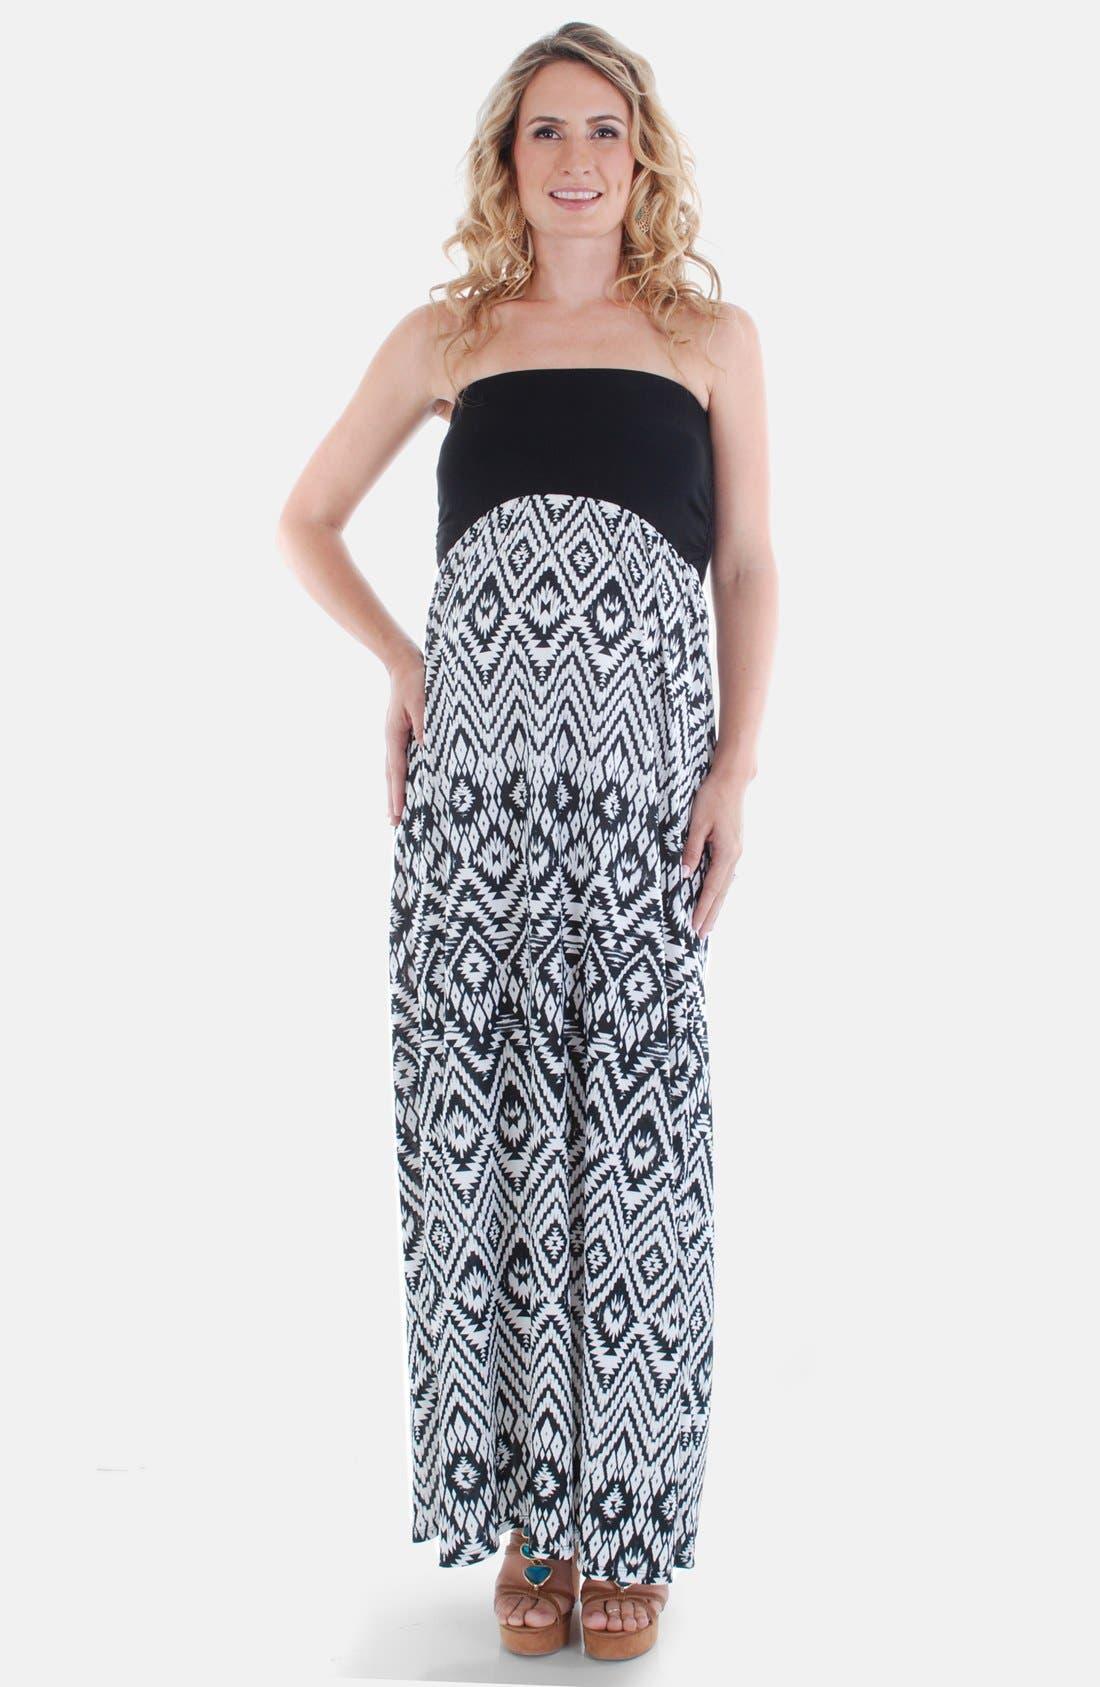 Main Image - Everly Grey 'Grace' Strapless Maternity Dress